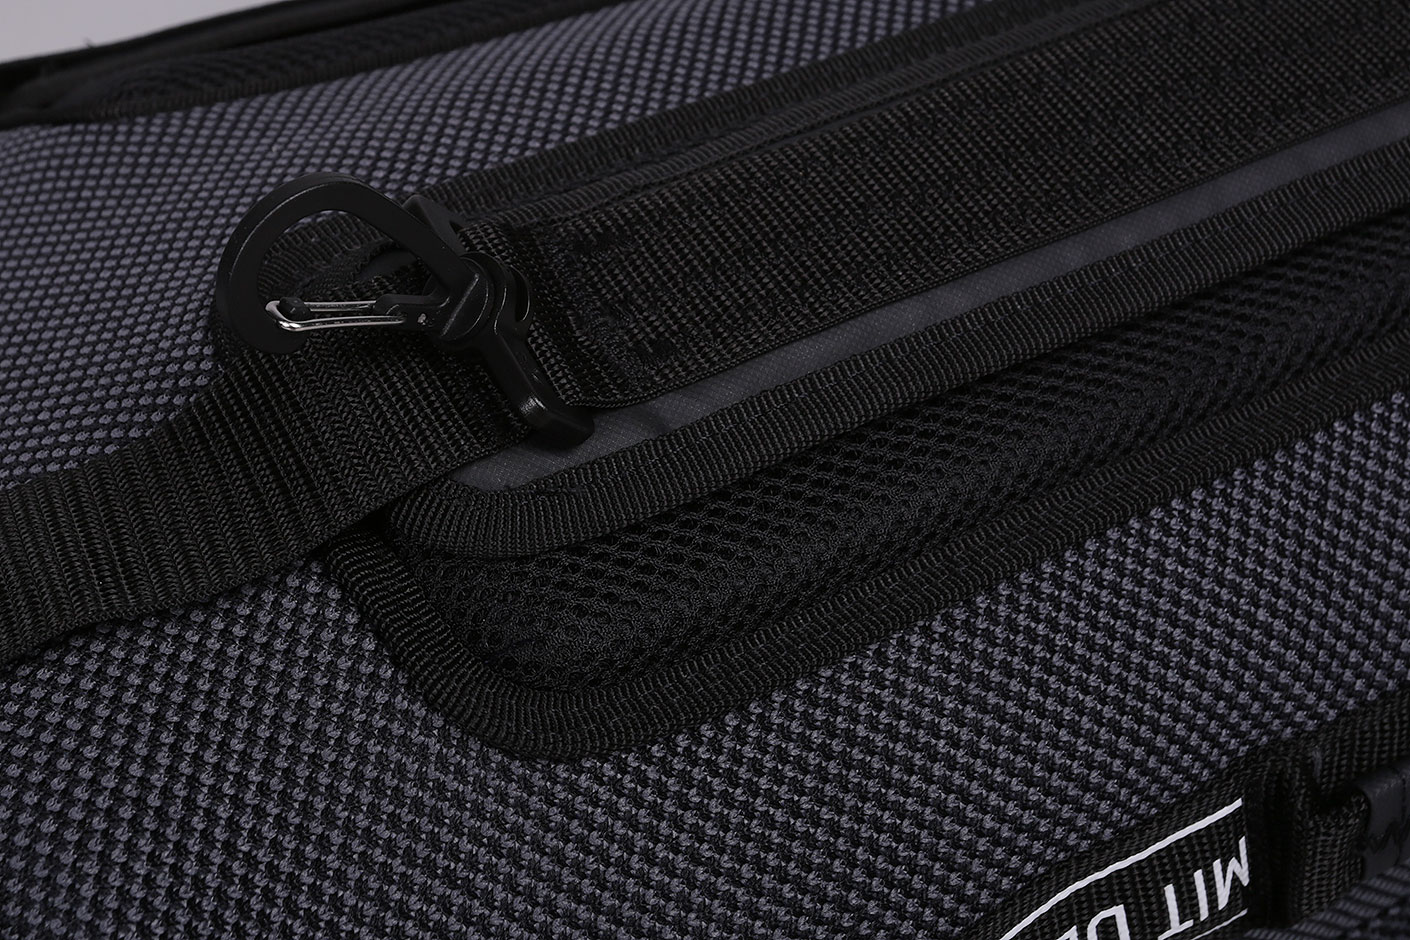 4e615440422 Серый рюкзак NMD BP S 22.4L от adidas Originals (DH3078) по цене ...